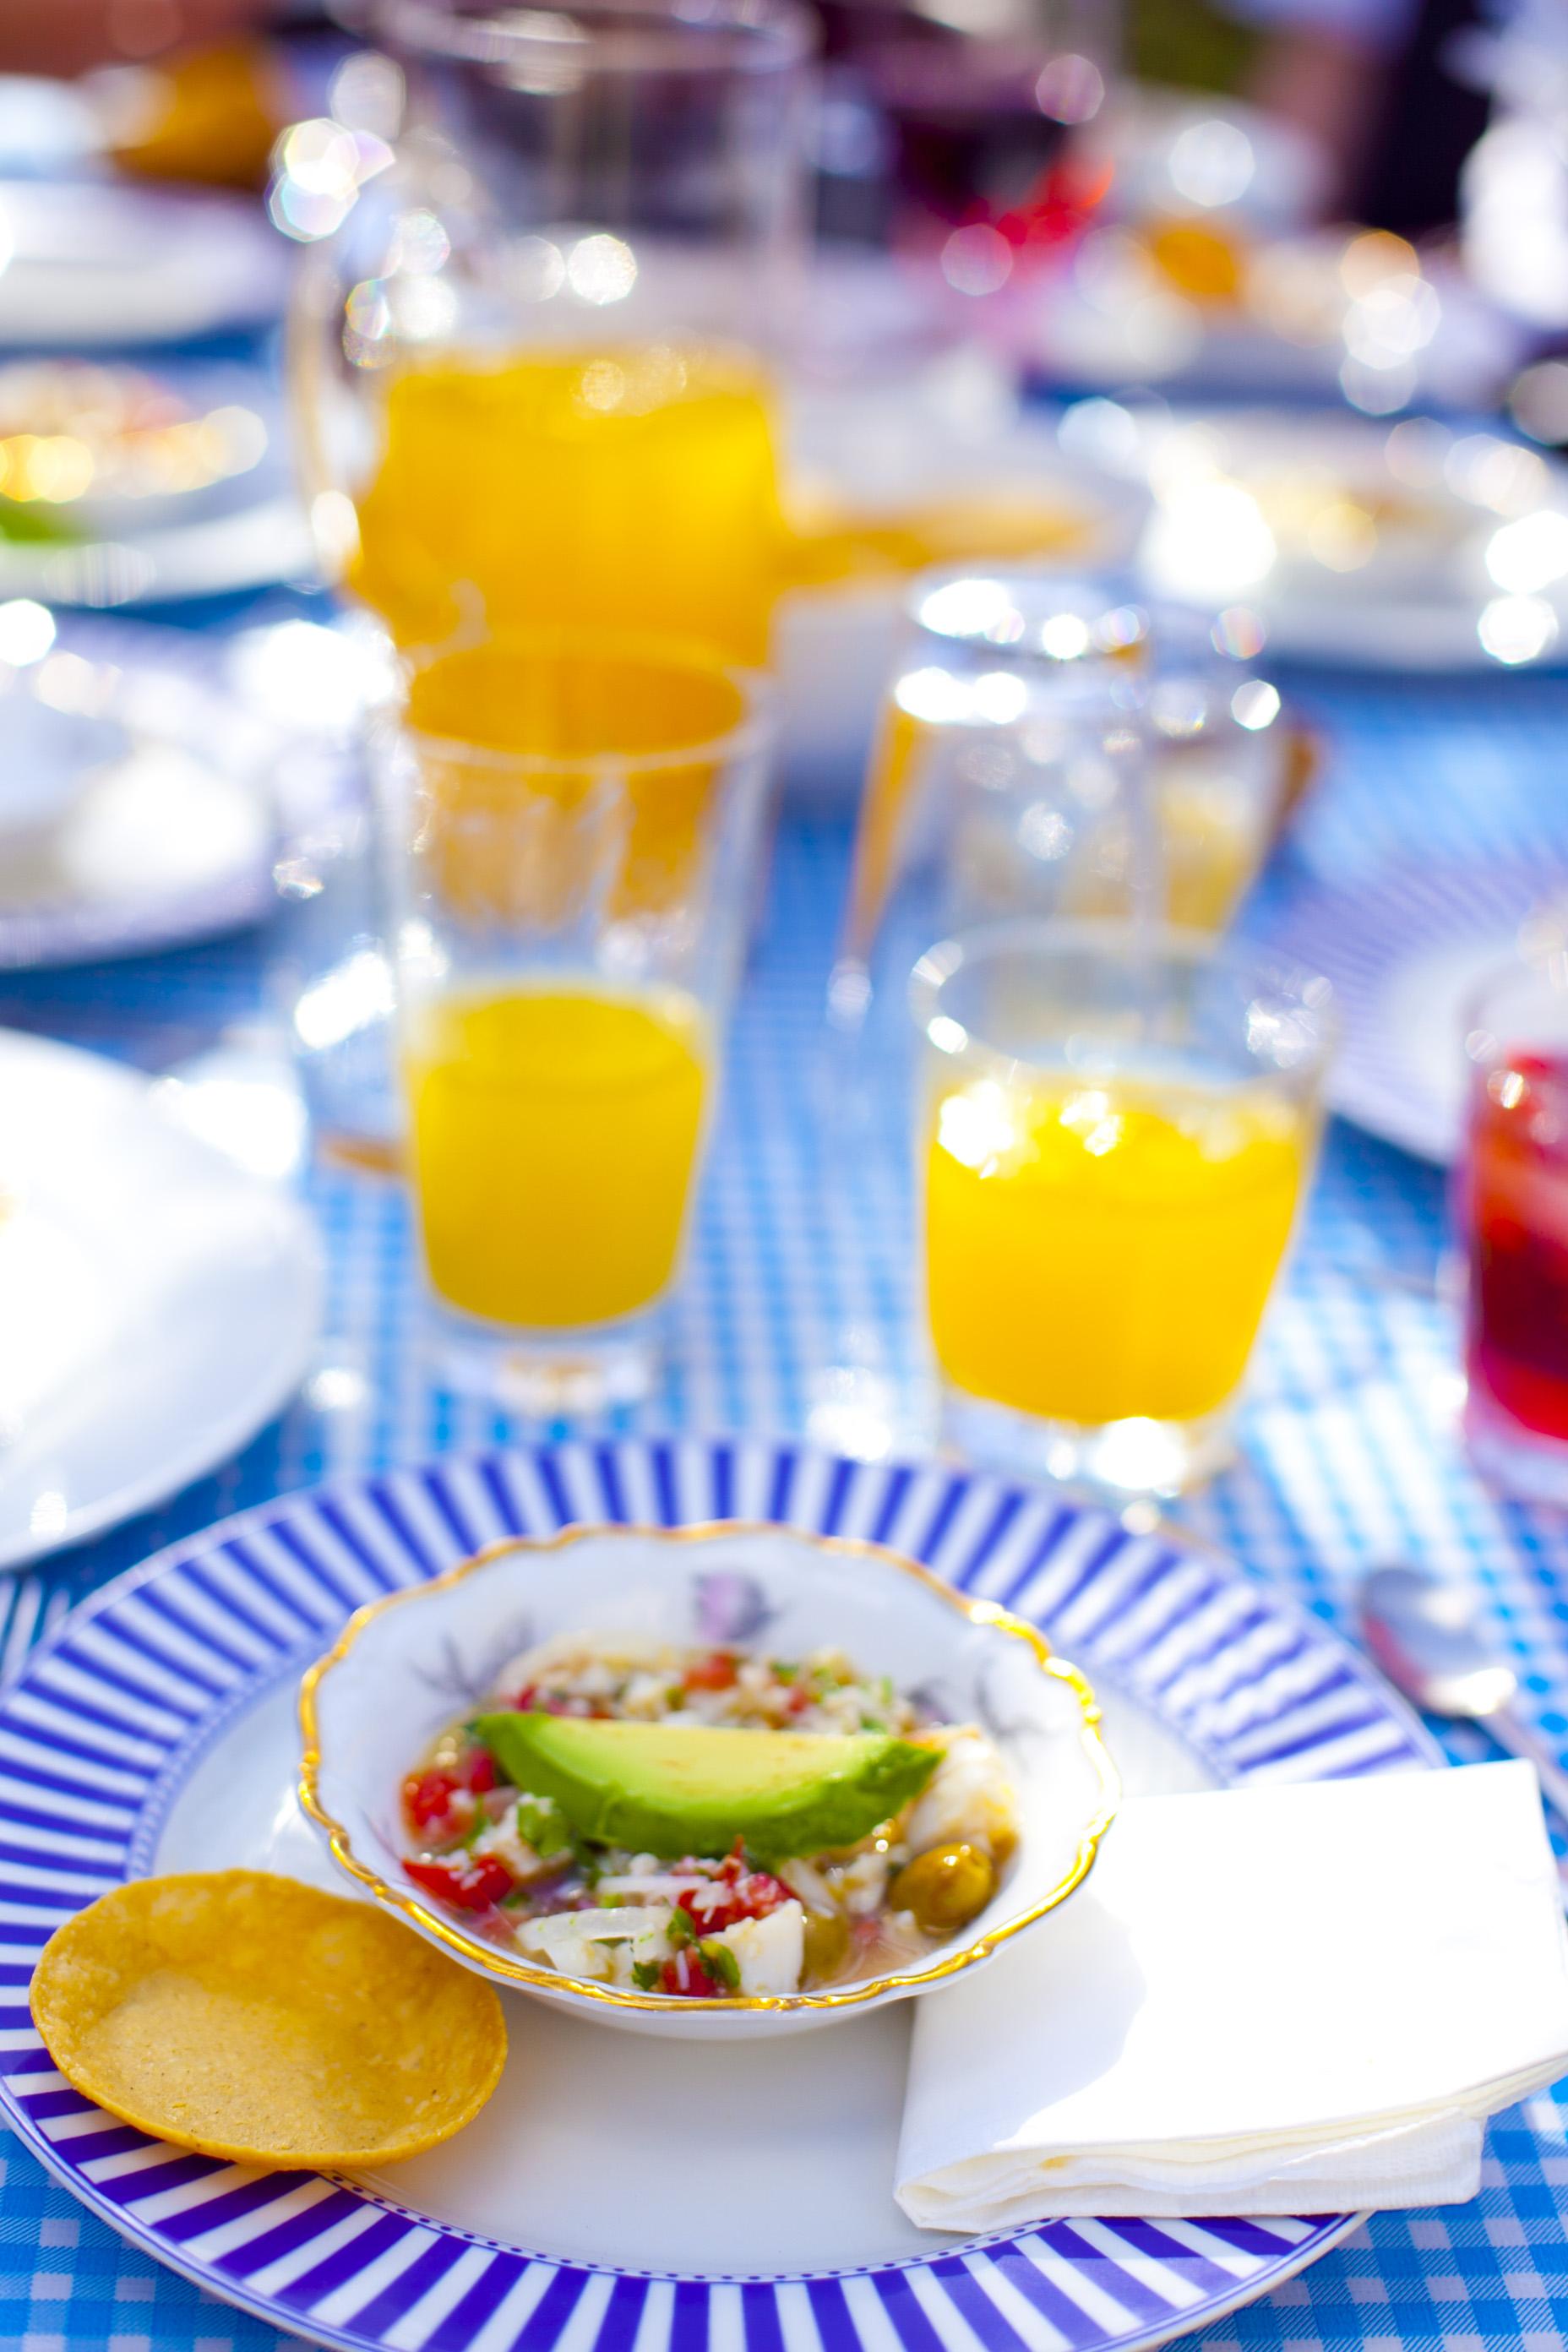 Copy of Ceviche Tostadas with fresh orange juice